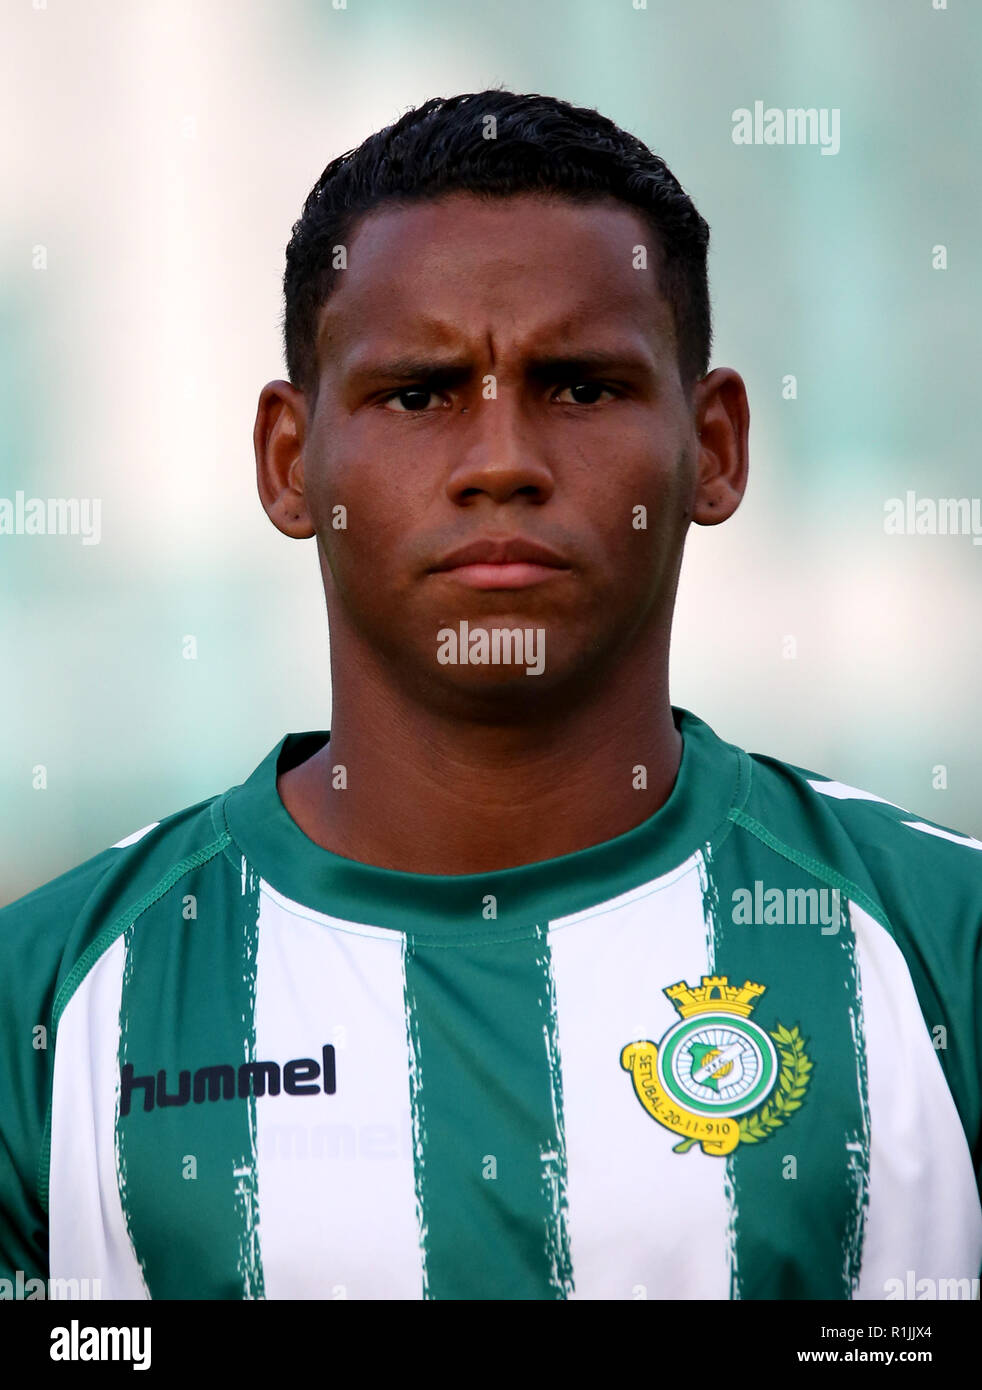 Portugal - Primeira Liga-NOS 2018-2019 /  ( Vitoria Setubal Futebol Clube ) -  Eber Henrique Ferreira Bessa ' Eber Bessa ' - Stock Image